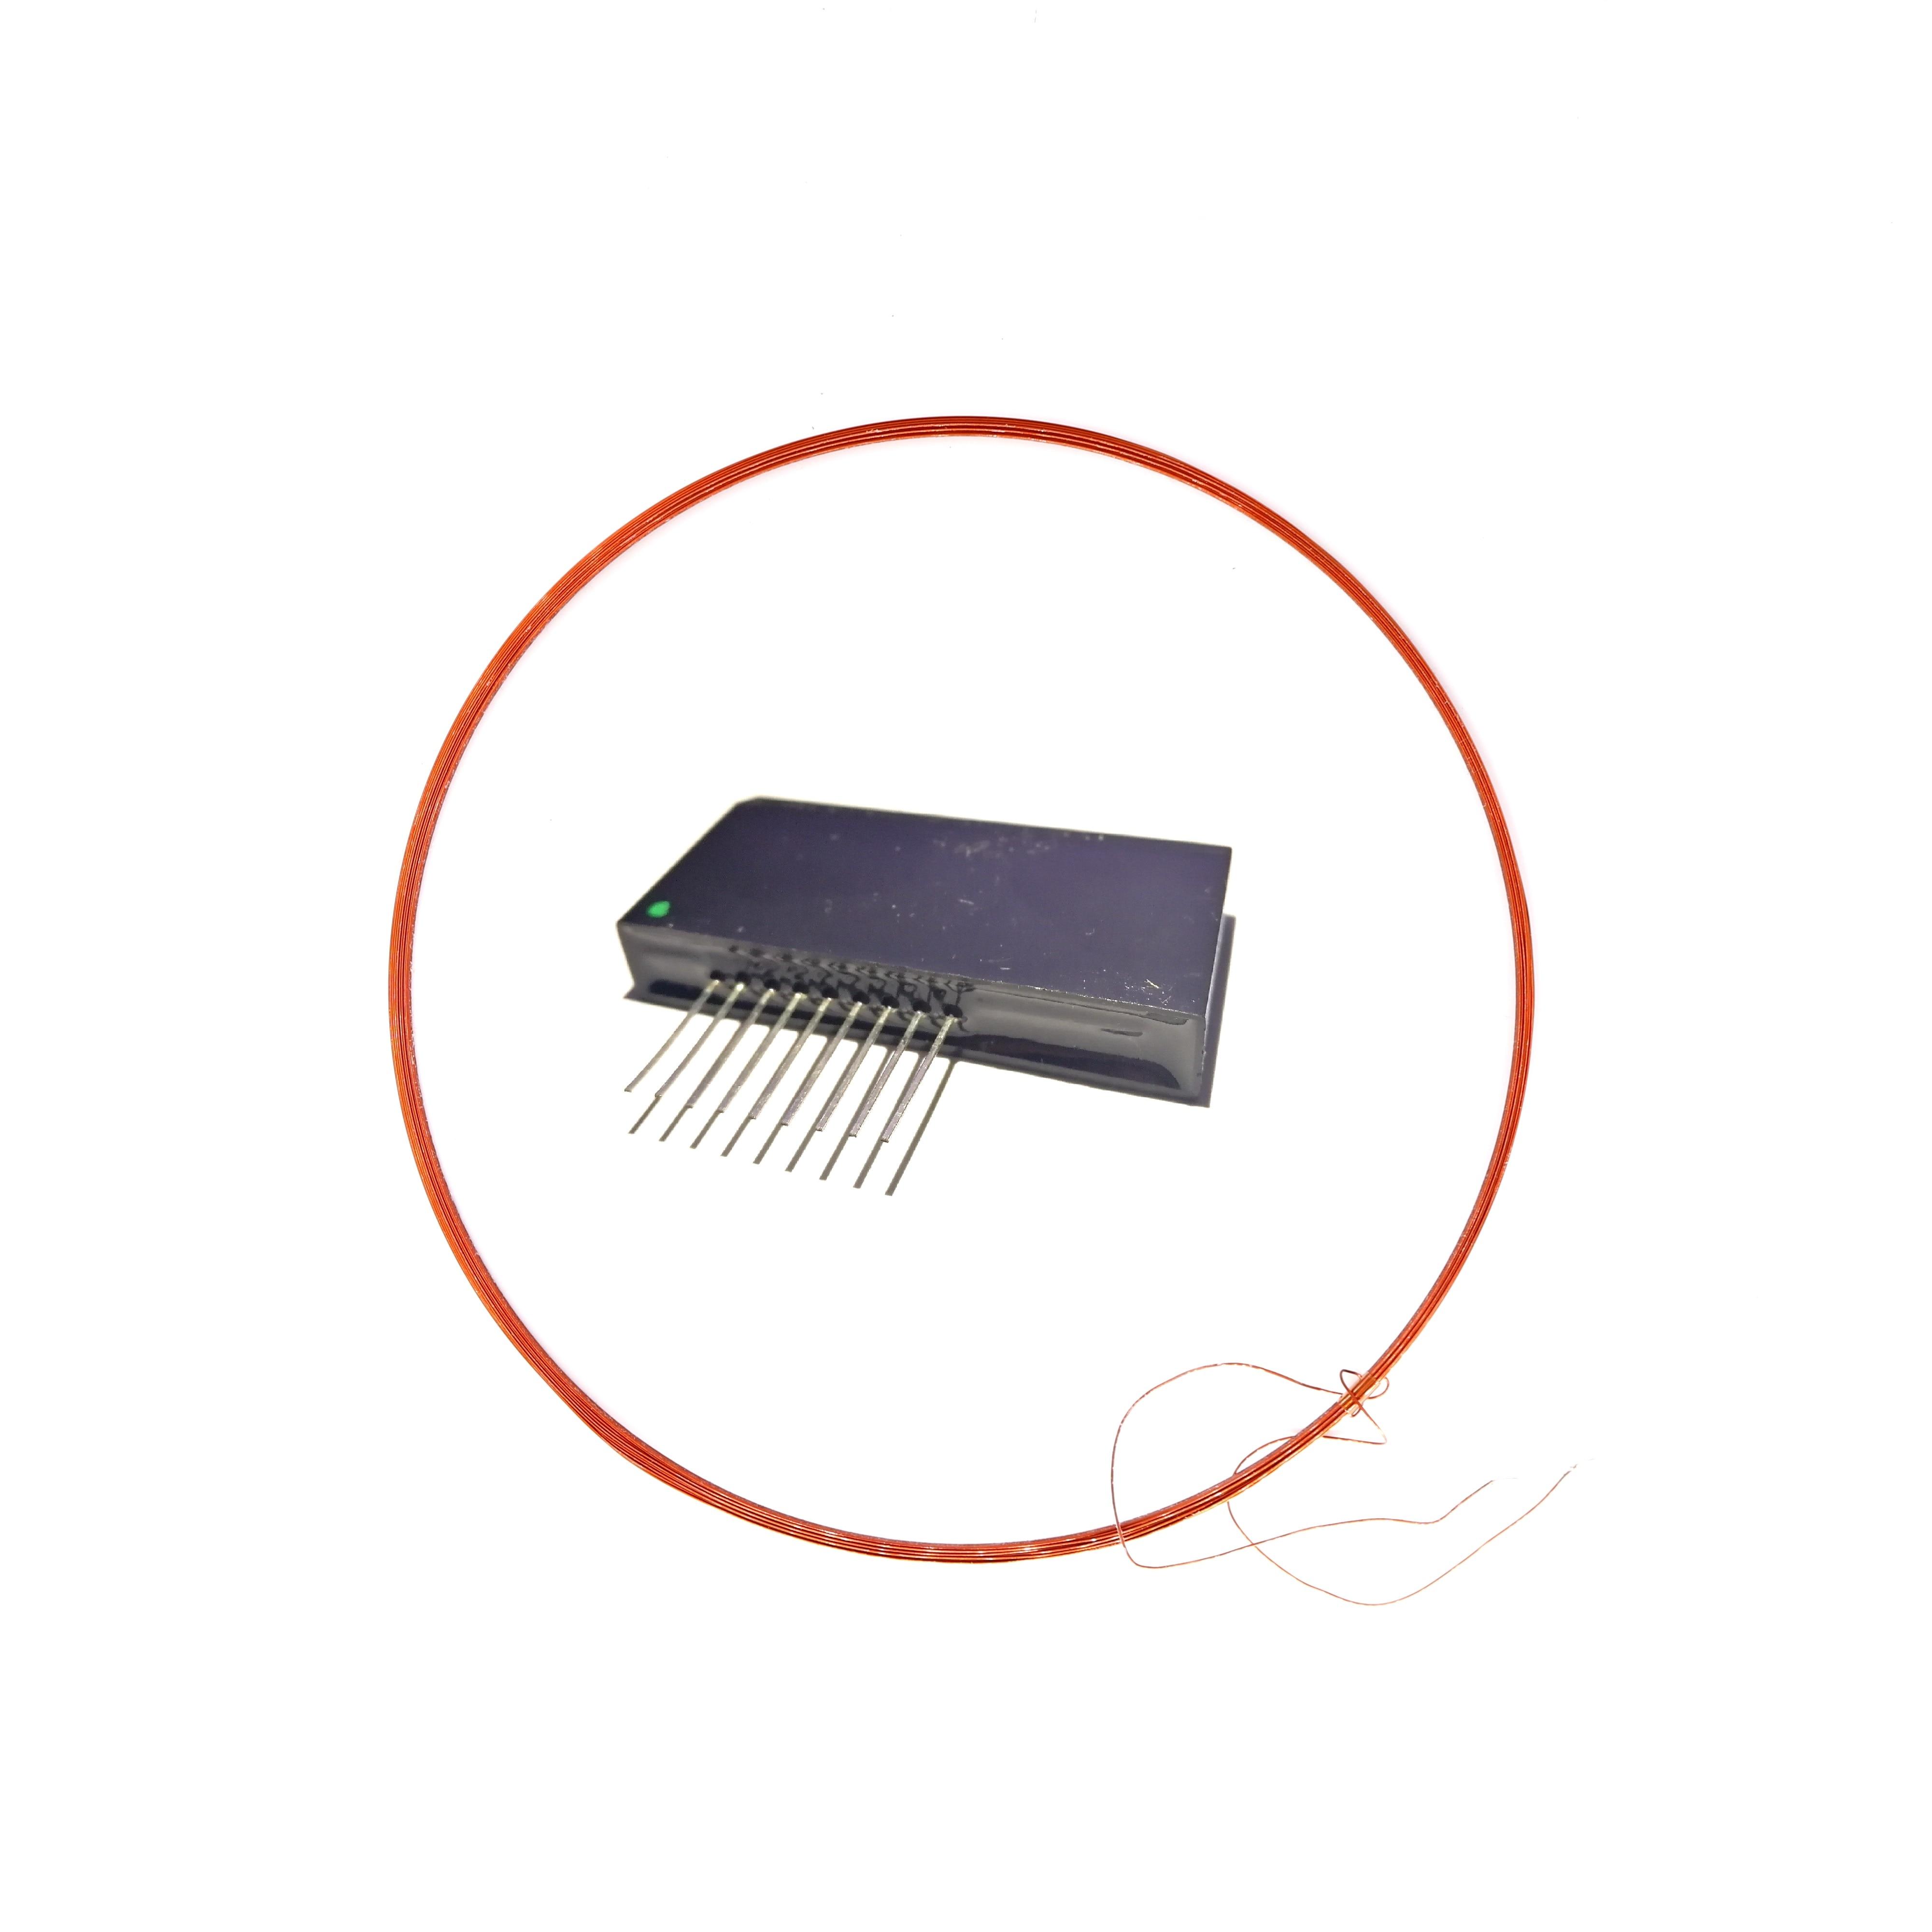 FDXB HDX 5V-9V Universal 134.2Khz Rfid Reader Module ISO/IEC11784/5 RS232 Arduino